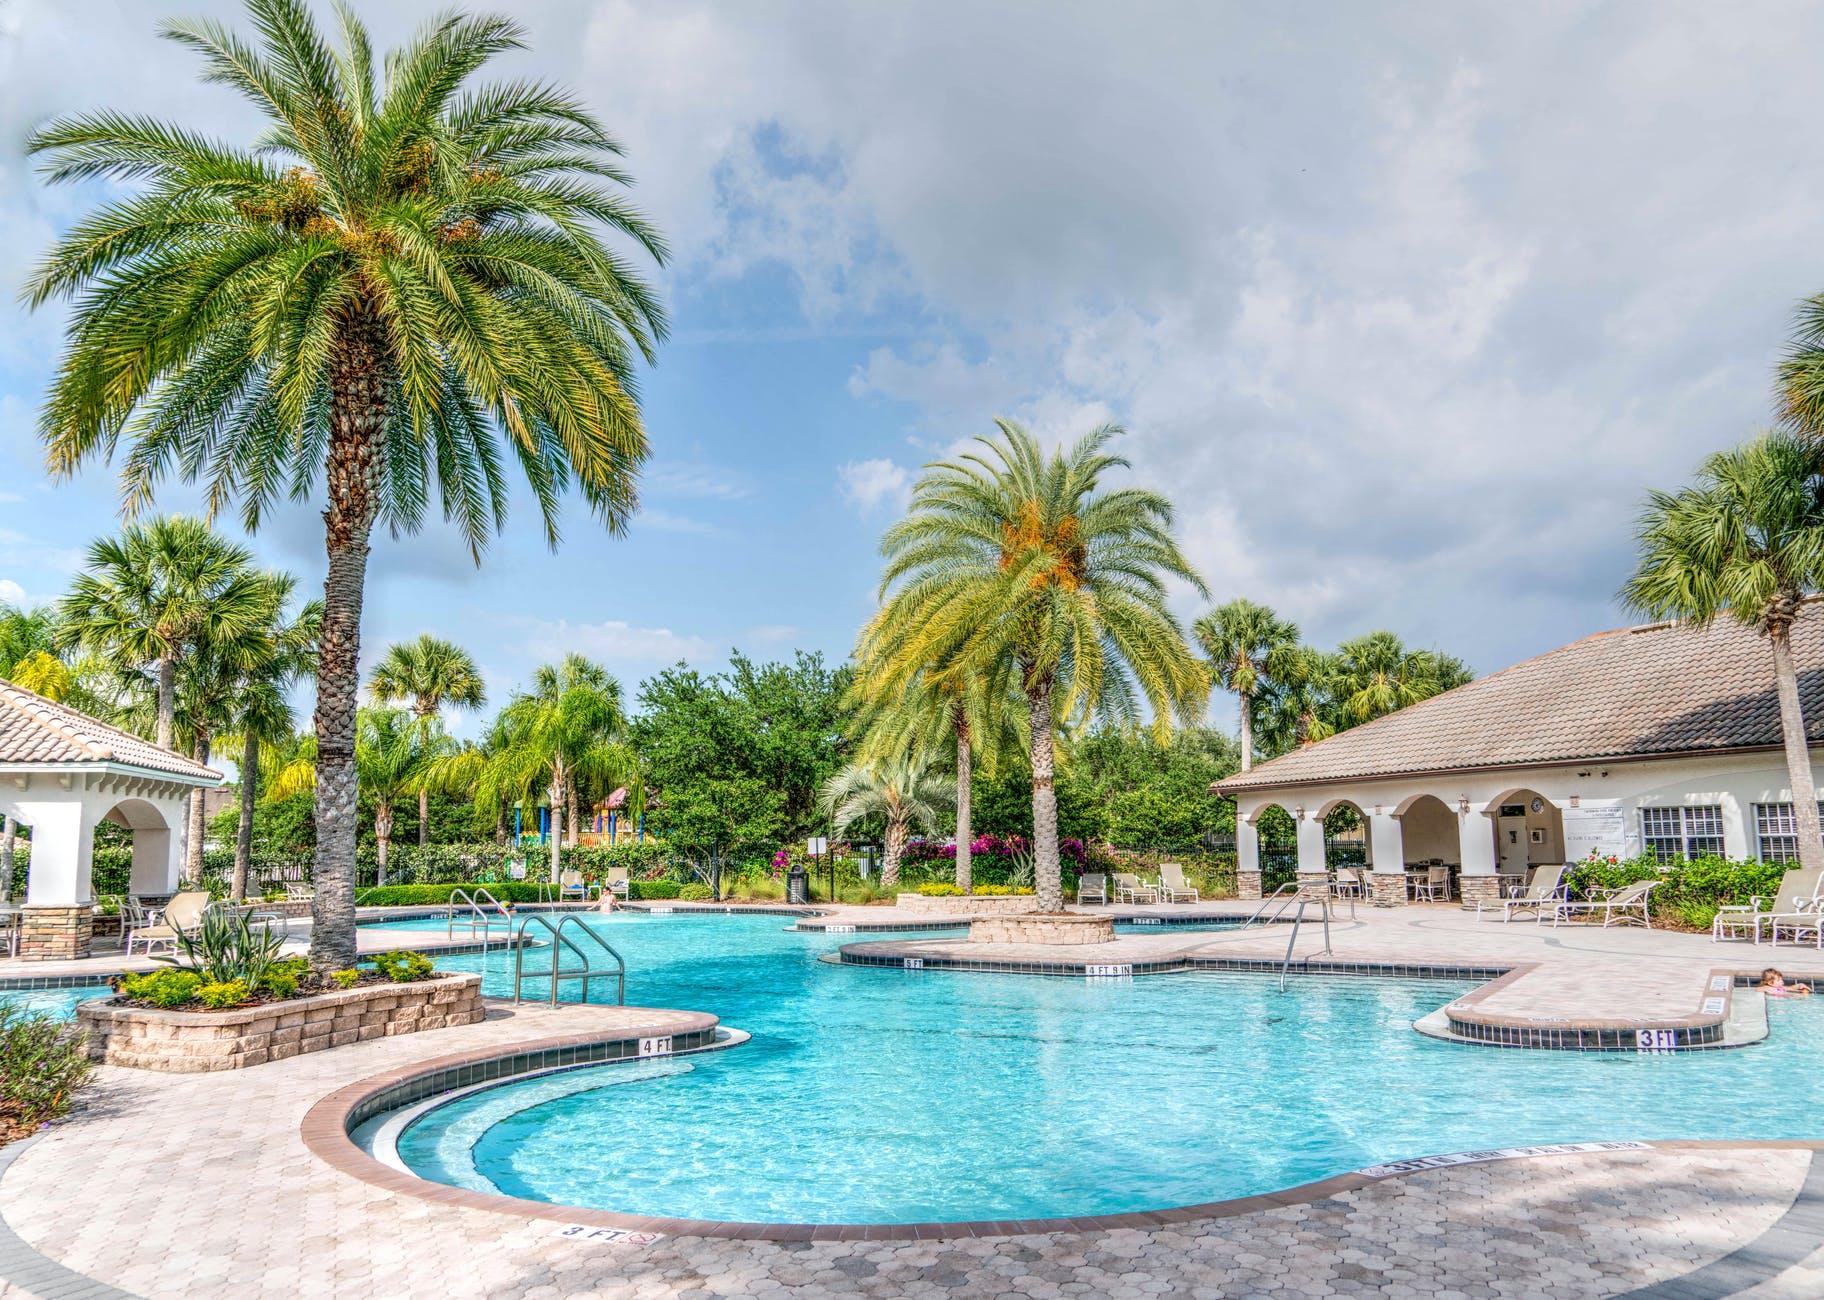 palm trees paradise pool poolside